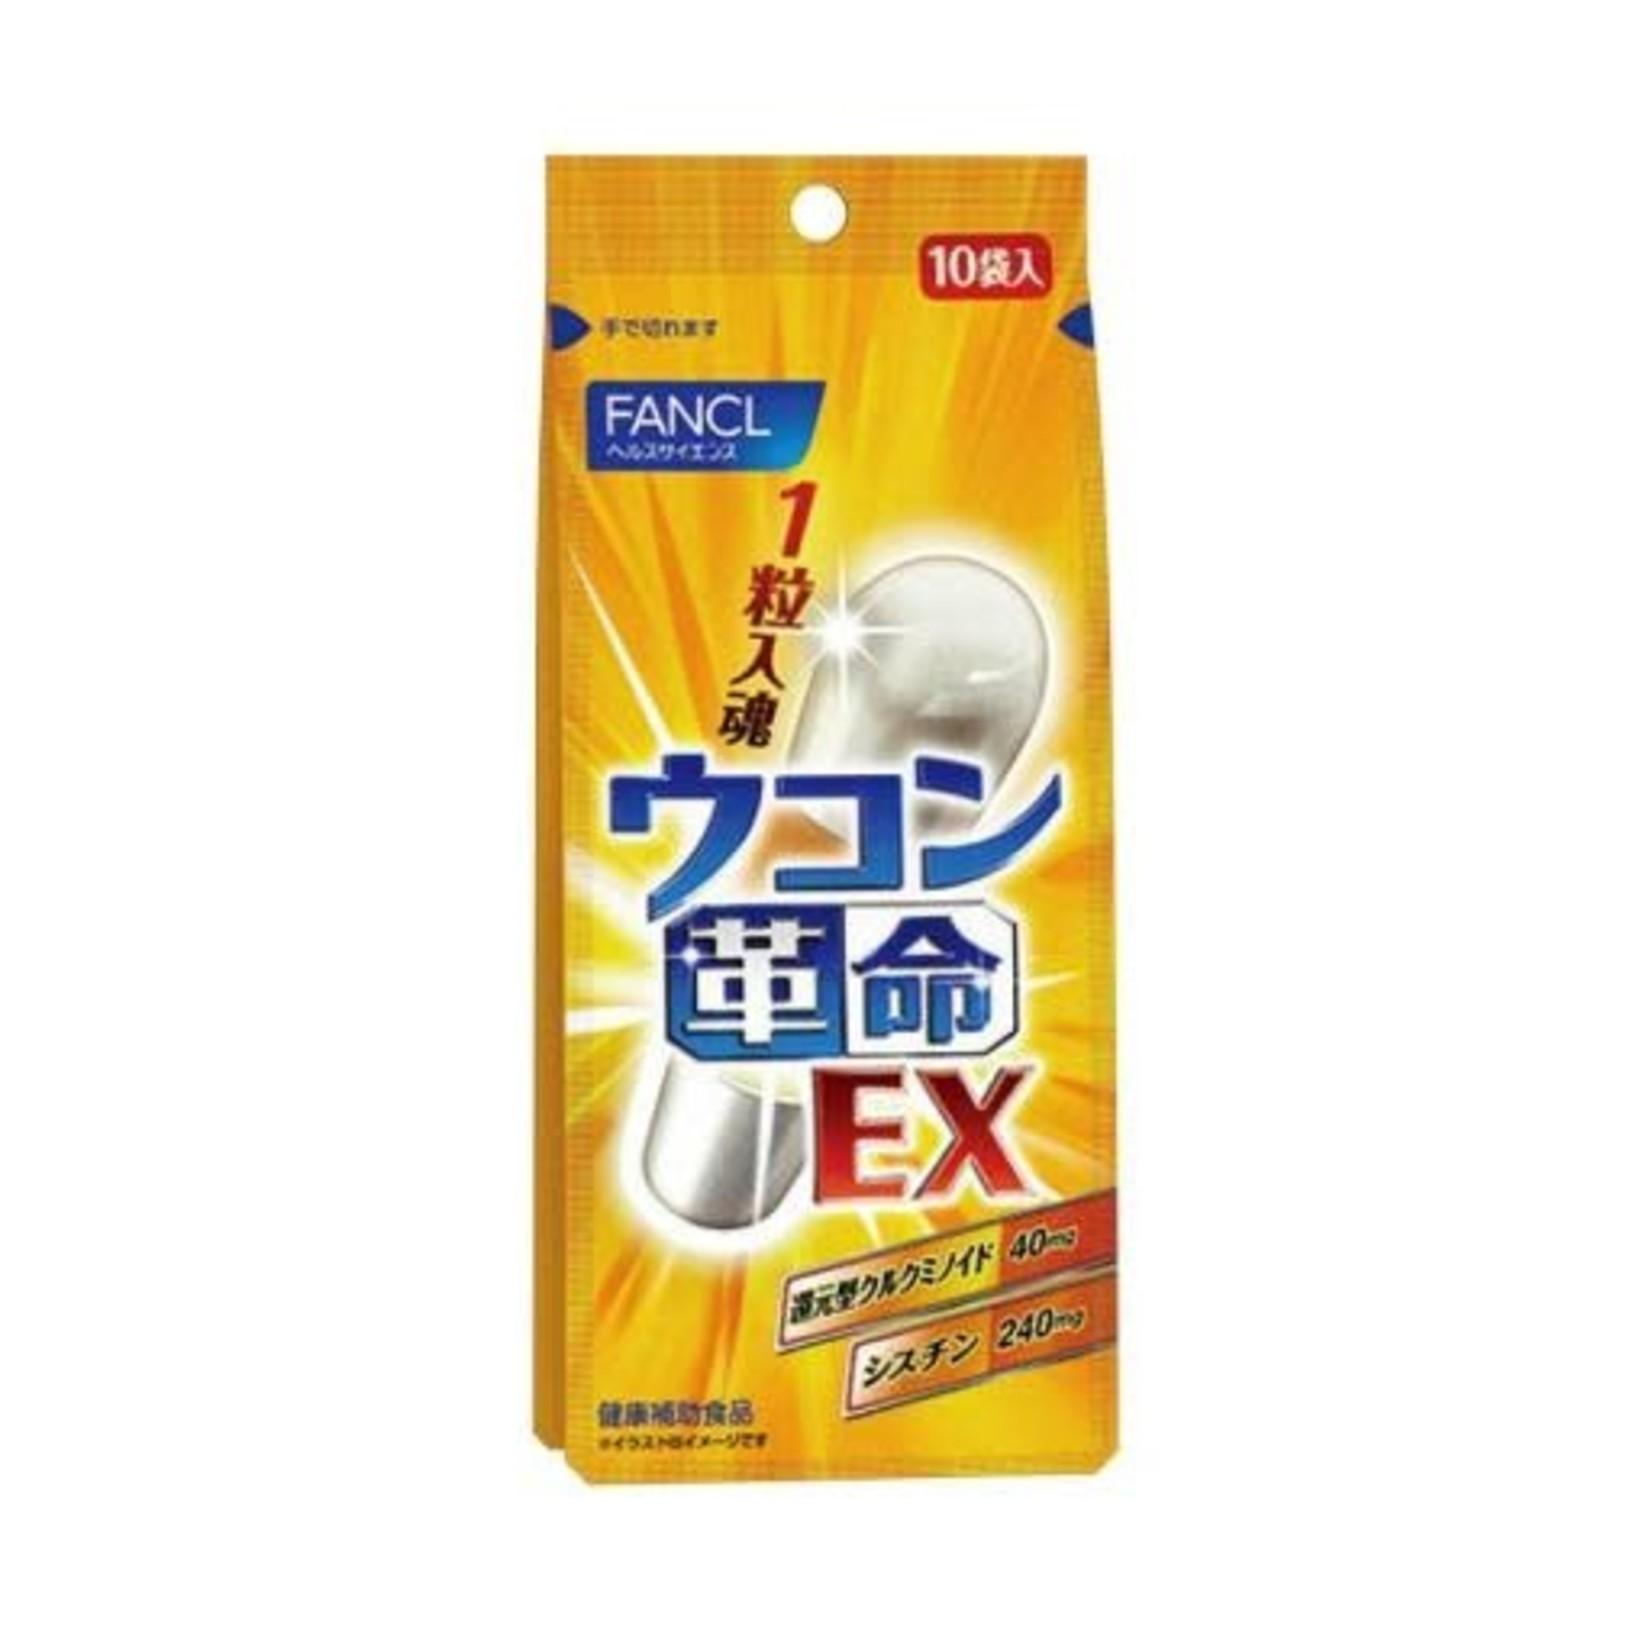 Fancl Fancl Turmeric Supplement - Protect Liver & Prevent Hangover 10 Bags